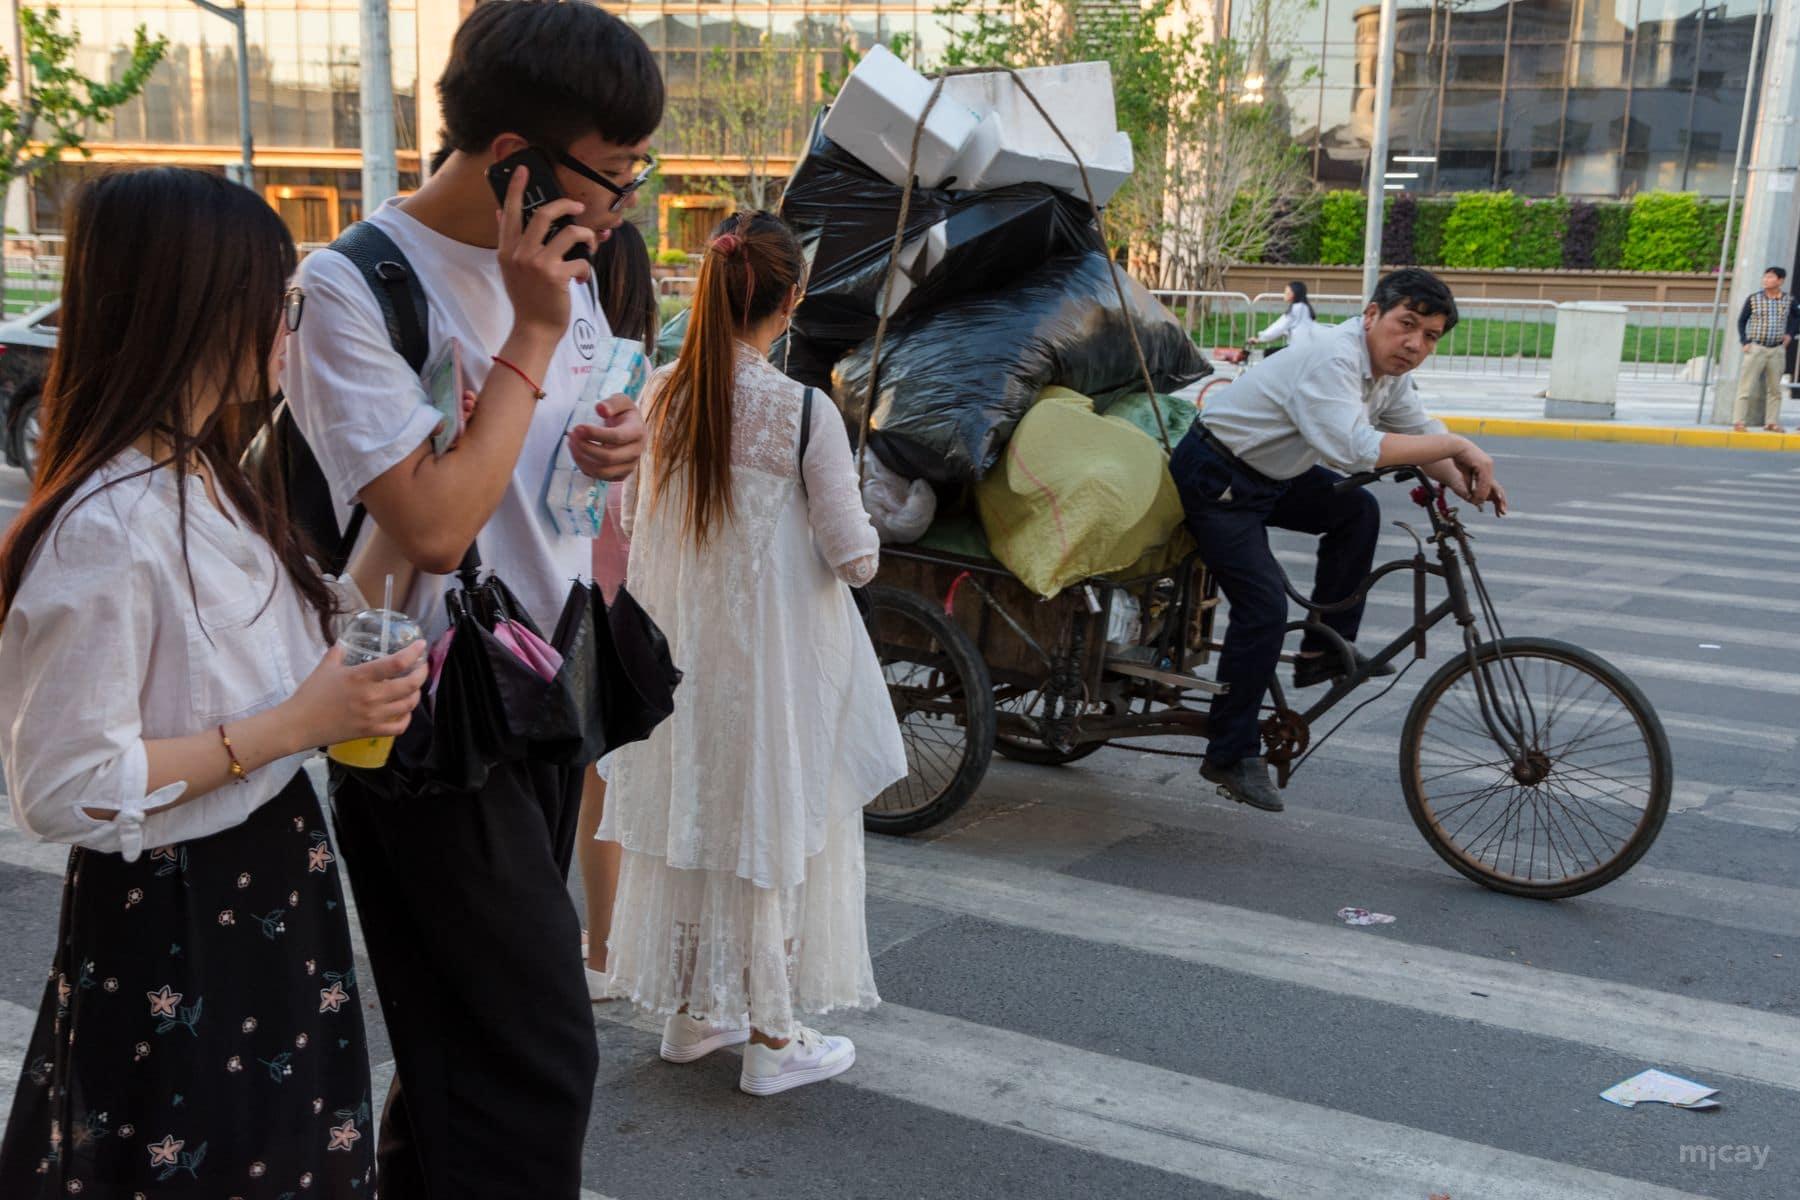 MichelAycaguer-levieuxShangai-streetphotography-28